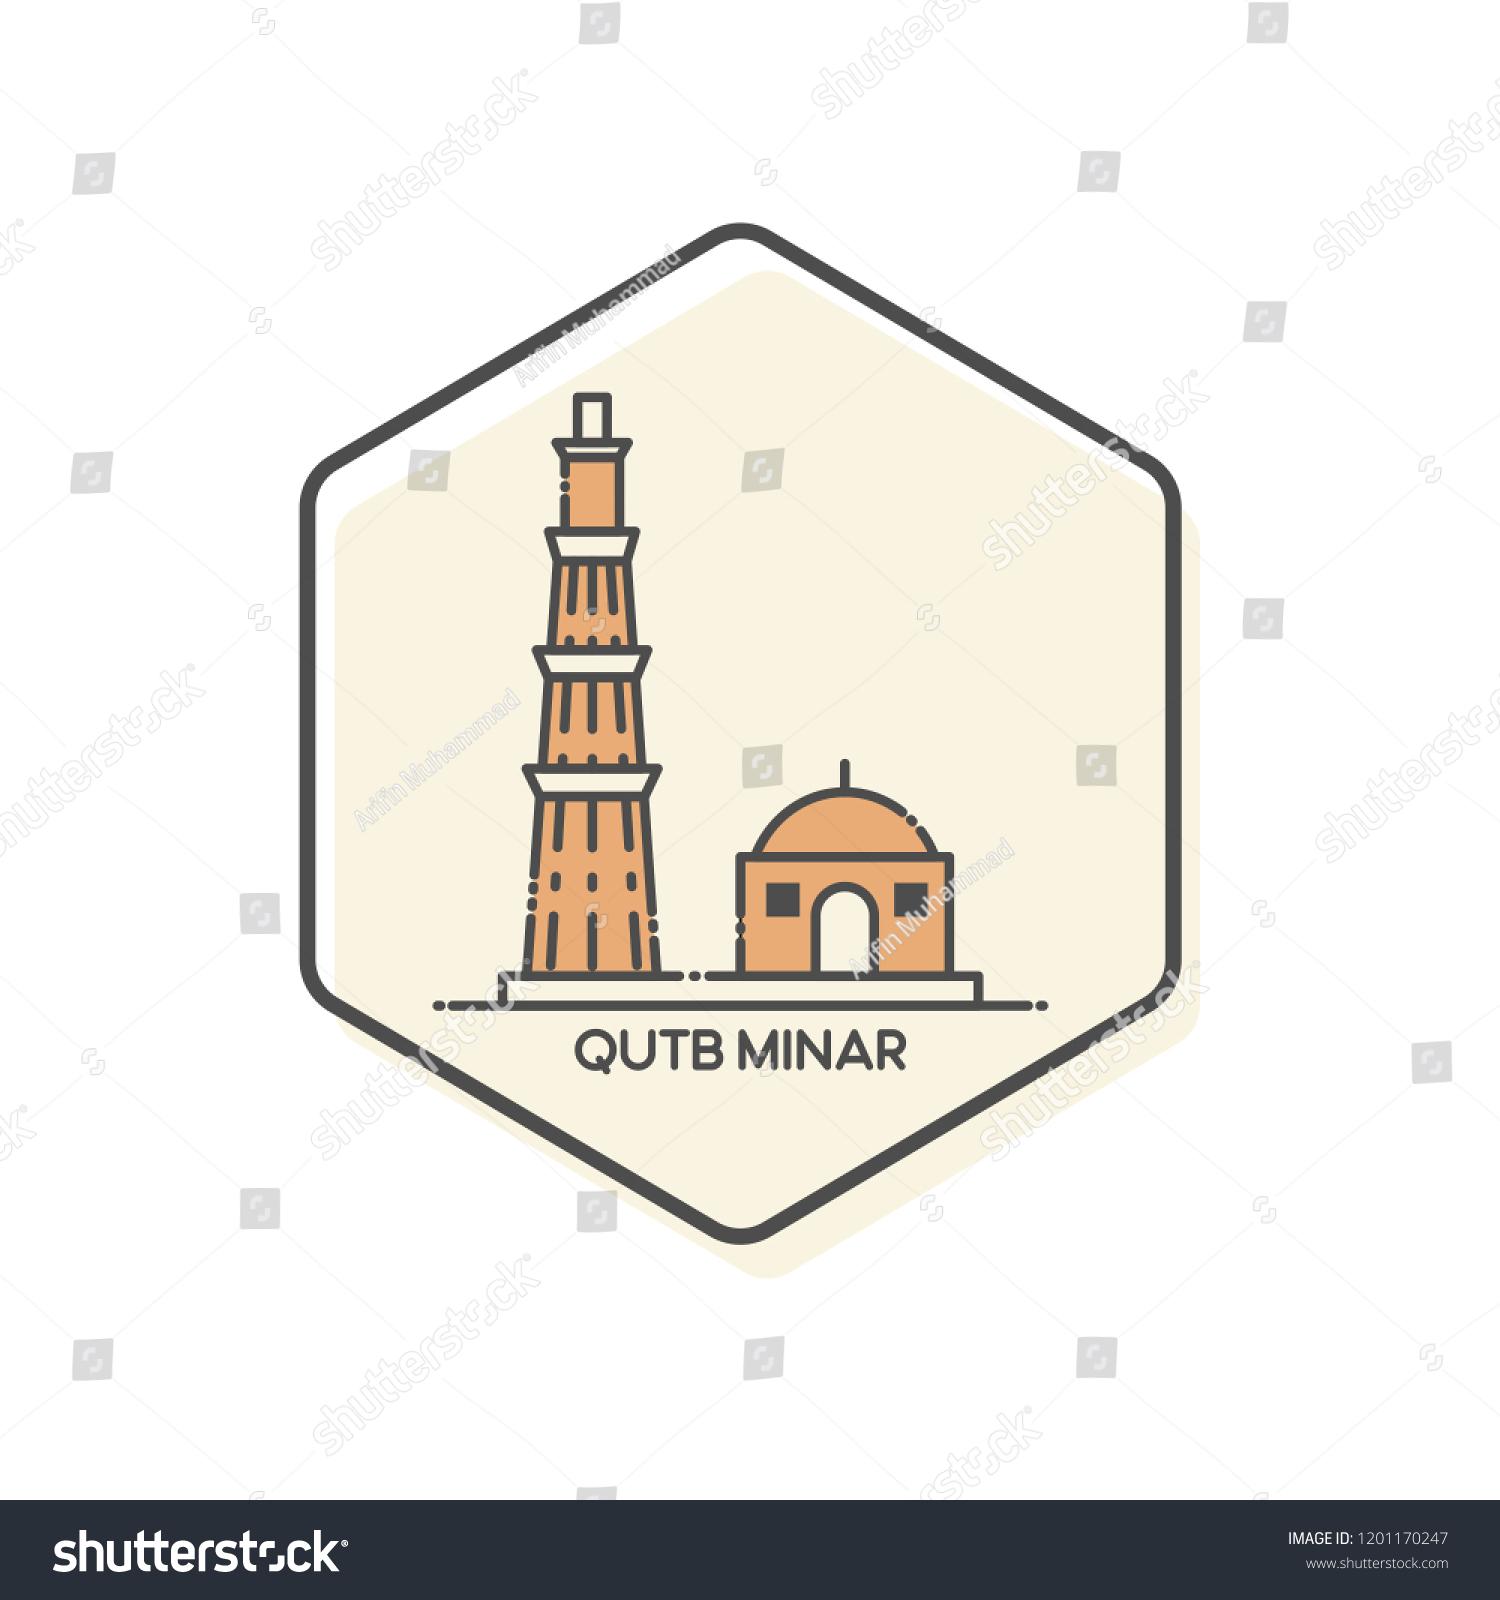 Qutb minar outline icon india